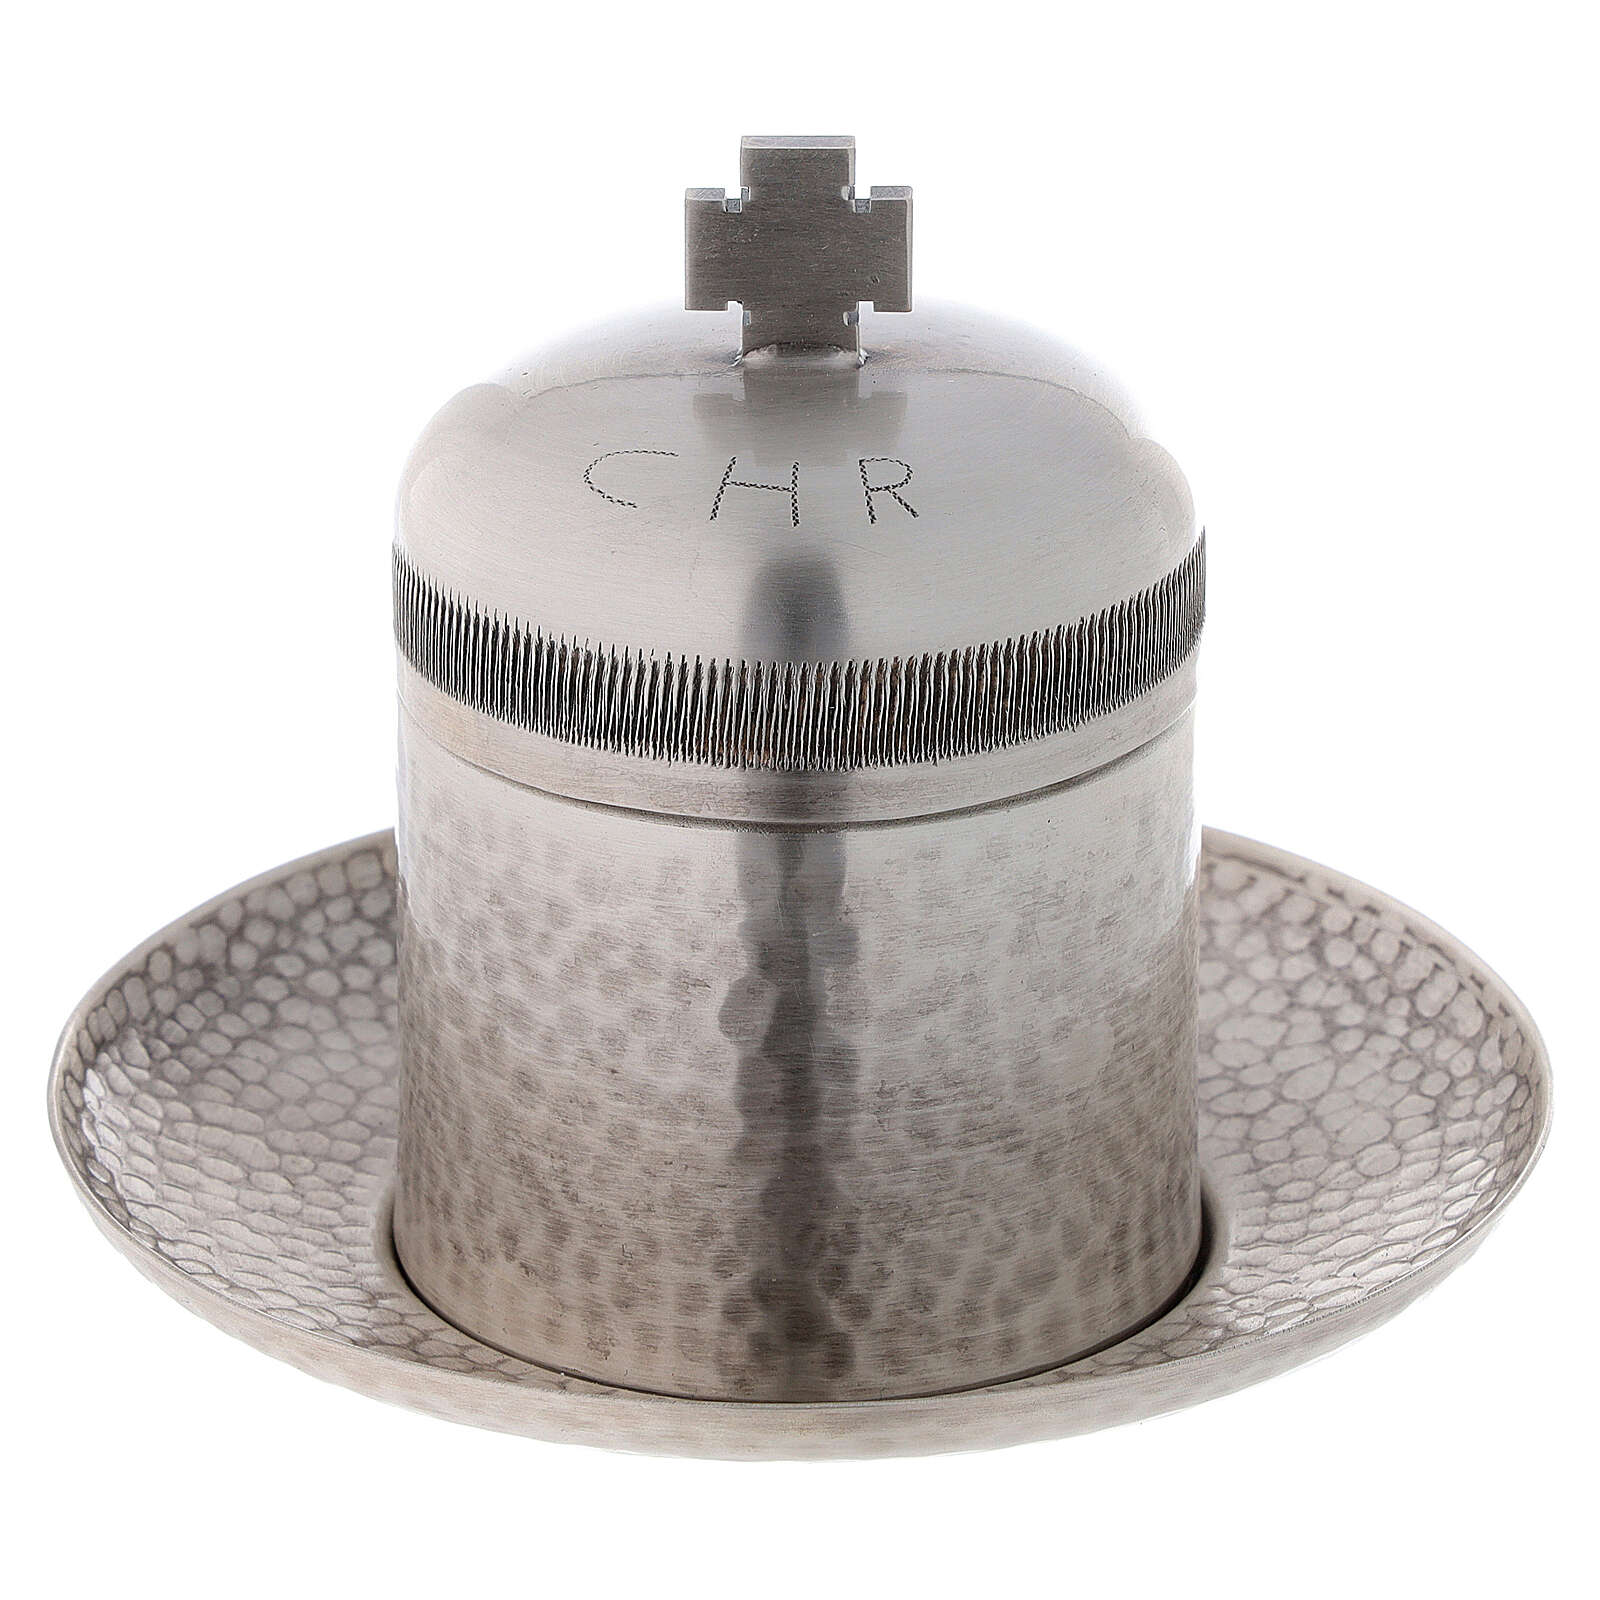 Sacred oil jar silvered brass Crisma 5 cc 3